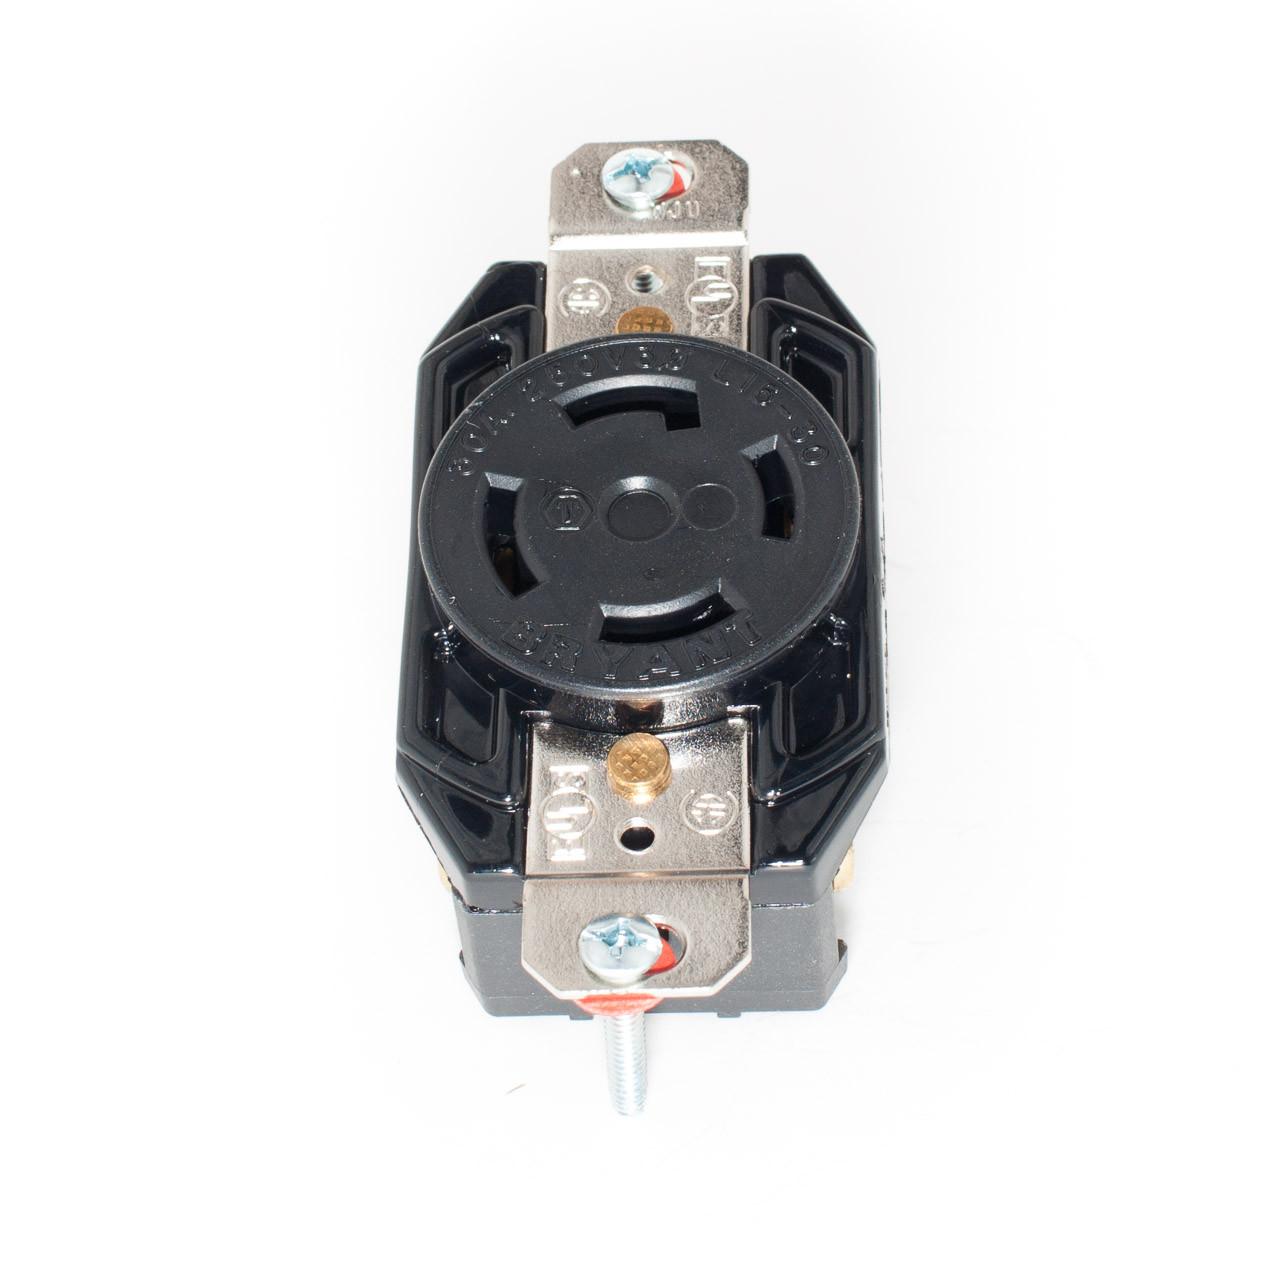 Exciting Nema 6-20r Twist Lock Wiring Diagram Pictures - Best Image on nema l5-30r wiring-diagram, nema 6 30p receptacle wiring-diagram, nema 650r receptacle, nema 14-50r wiring-diagram, nema receptacles style, nema 6 50 wiring, nema 5-20r, nema 2000 wiring diagram, nema l21-30r, nema 6-20p plug receptacle, nema 5-15p wiring-diagram, nema plugs and sockets, nema cord cap configurations, nema 7 actuator, nema l14-20p wiring-diagram, nema electrical outlet types, nema plug c, nema 6-30r wiring-diagram, nema 5-15p plug adapter,